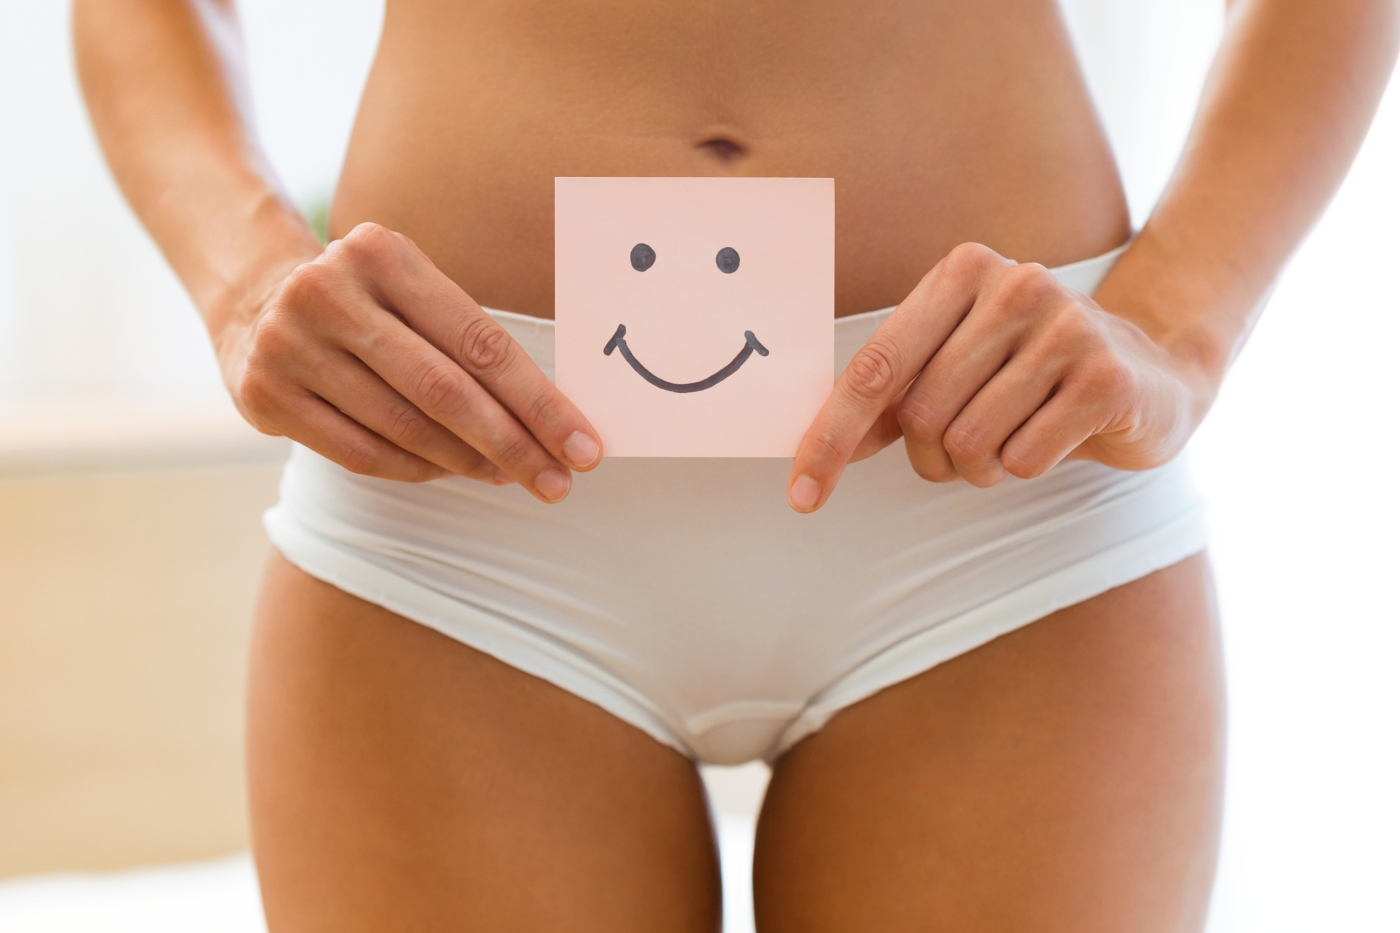 tratar a higiene íntima feminina